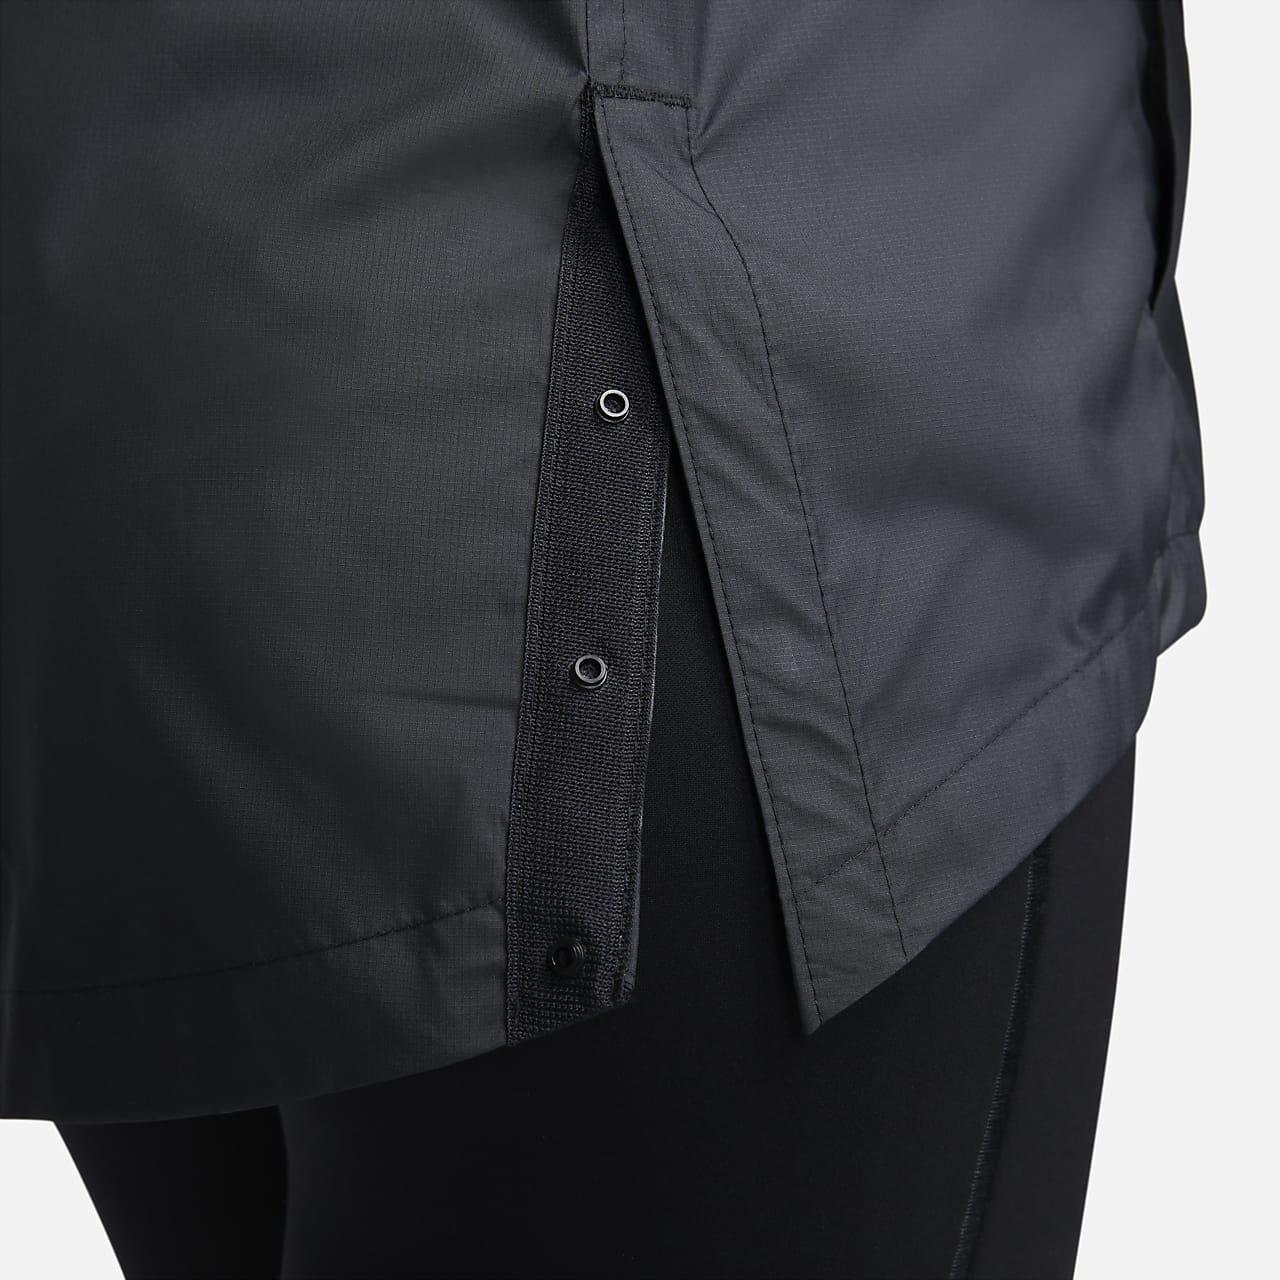 c519737c07b9 Nike Essential Women s Packable Running Rain Jacket. Nike.com AU